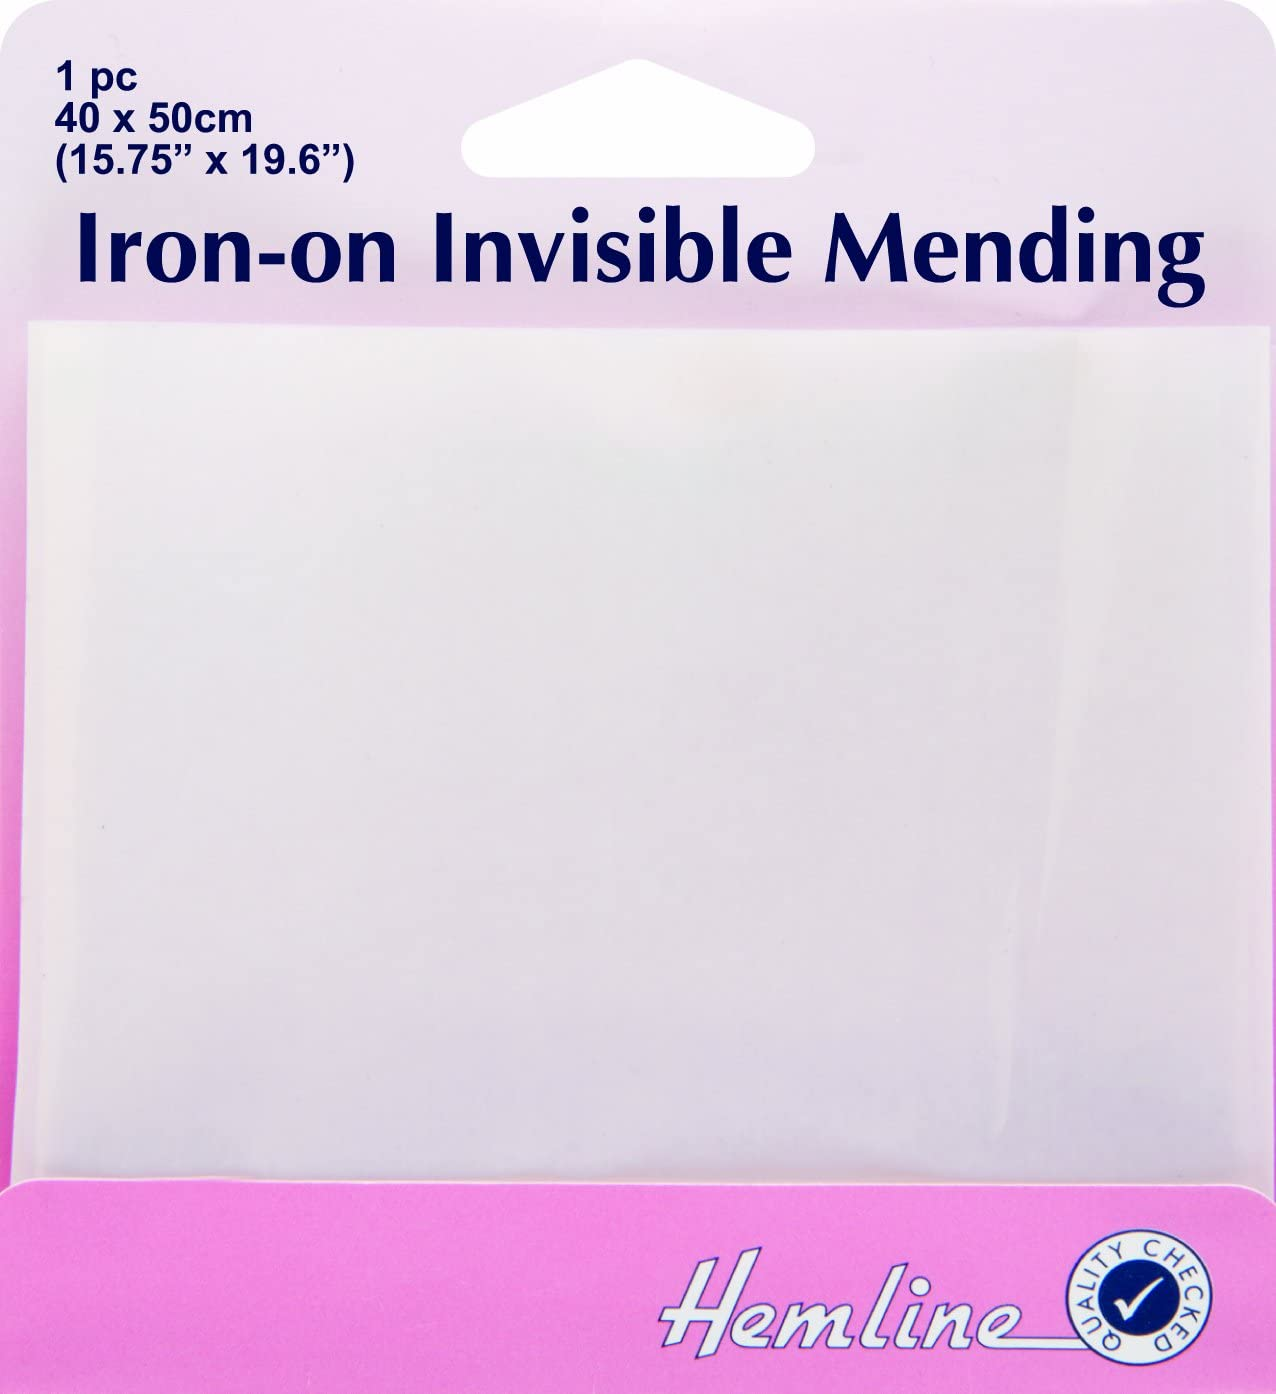 Hemline Iron-On Invisible Mending 40x50cm 1pc